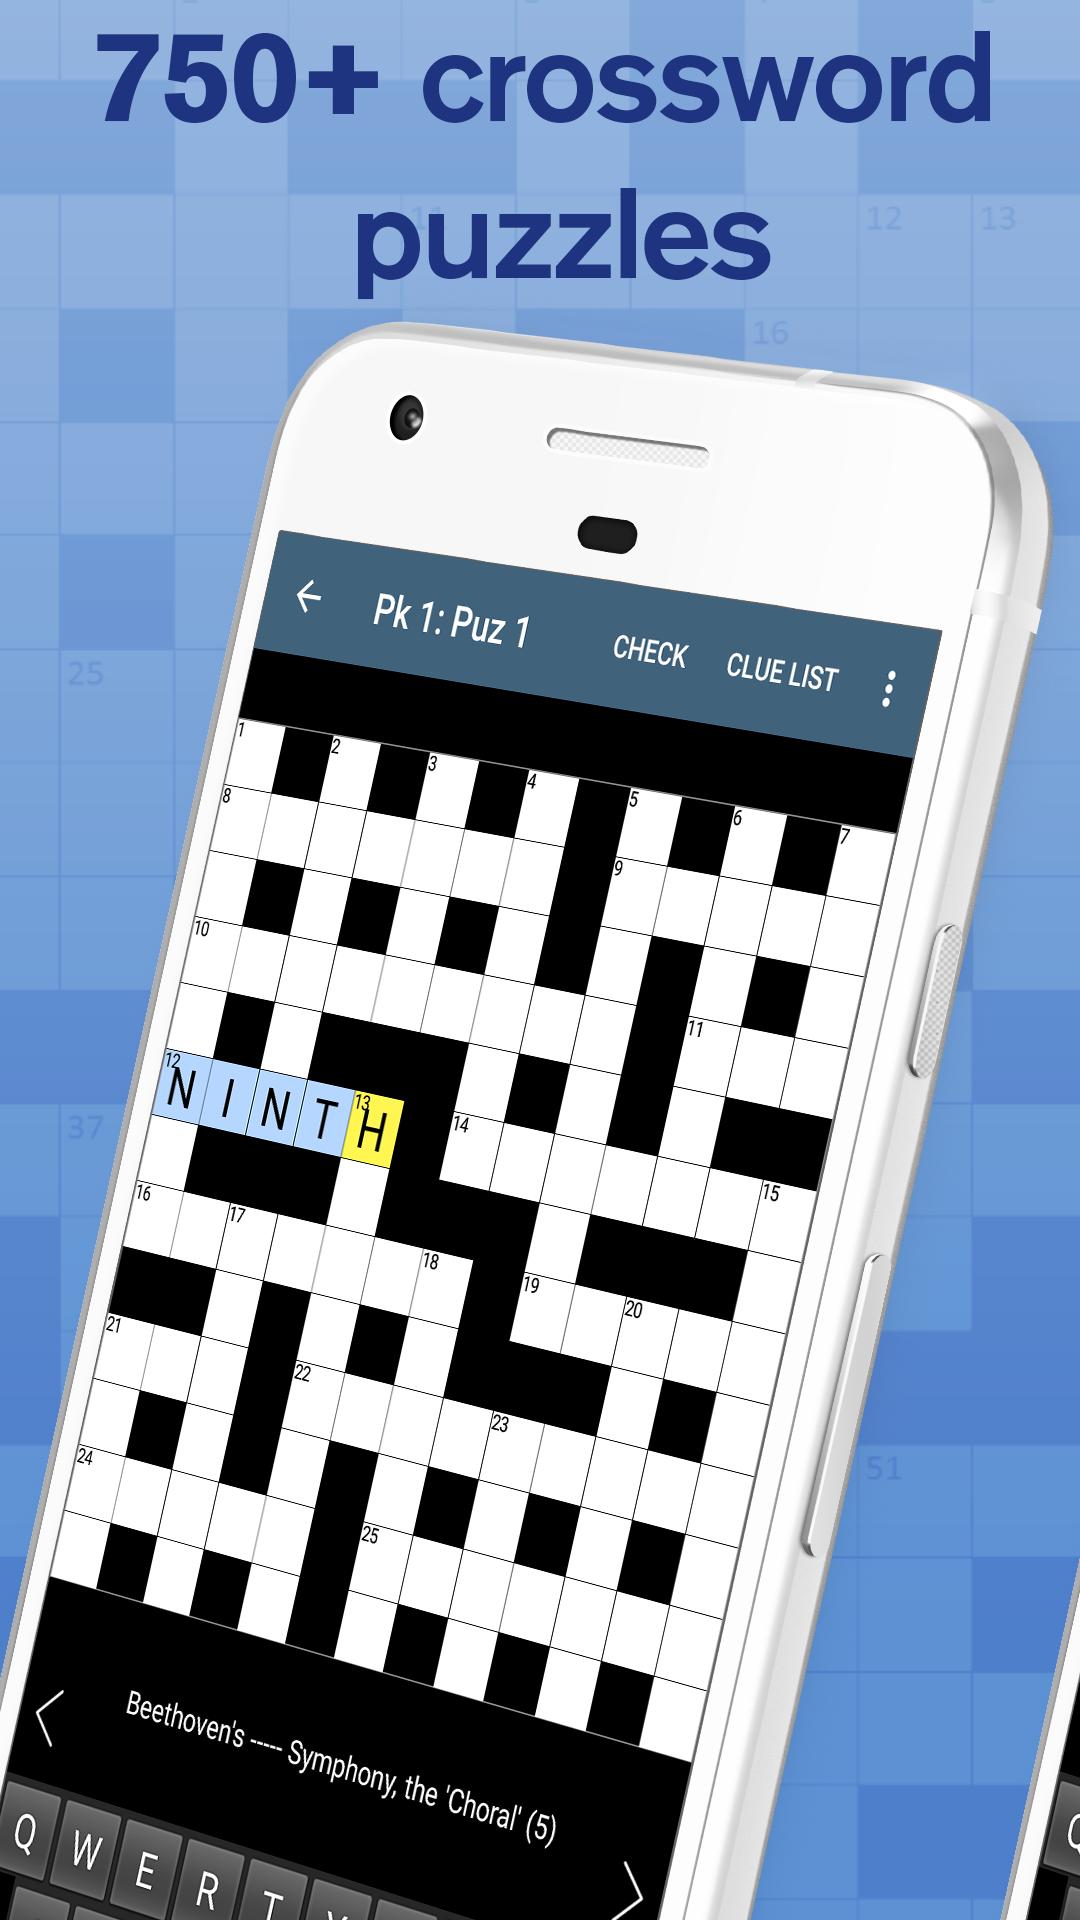 amazon com crossword appstore for android rh amazon com sweater letters crossword clue hebrew letter crossword clue